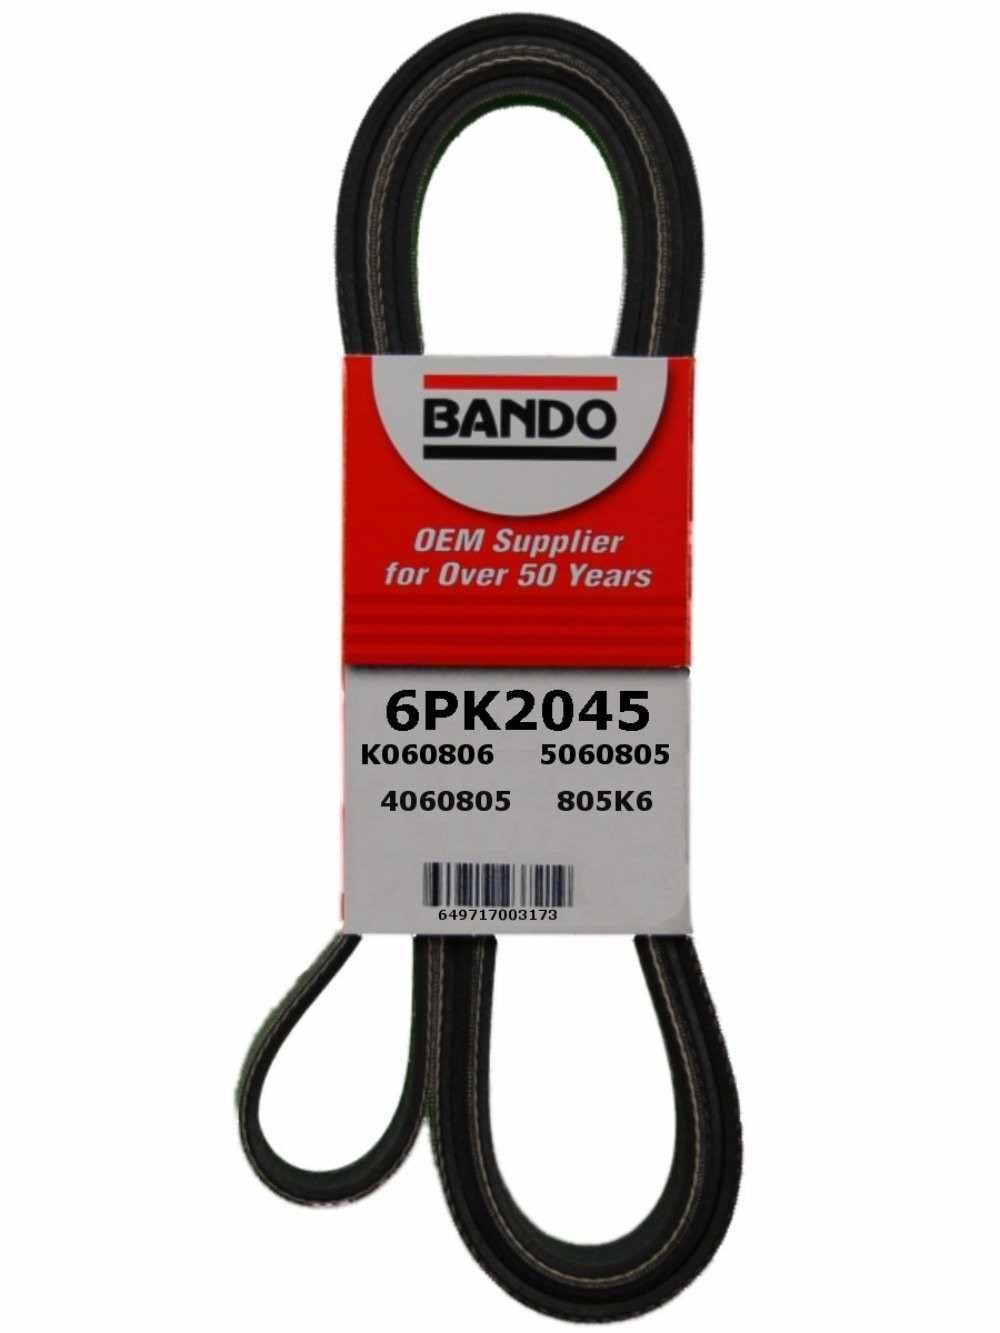 BANDO - Serpentine Belt (Alternator, Water Pump and Power Steering) - BWO 6PK2045